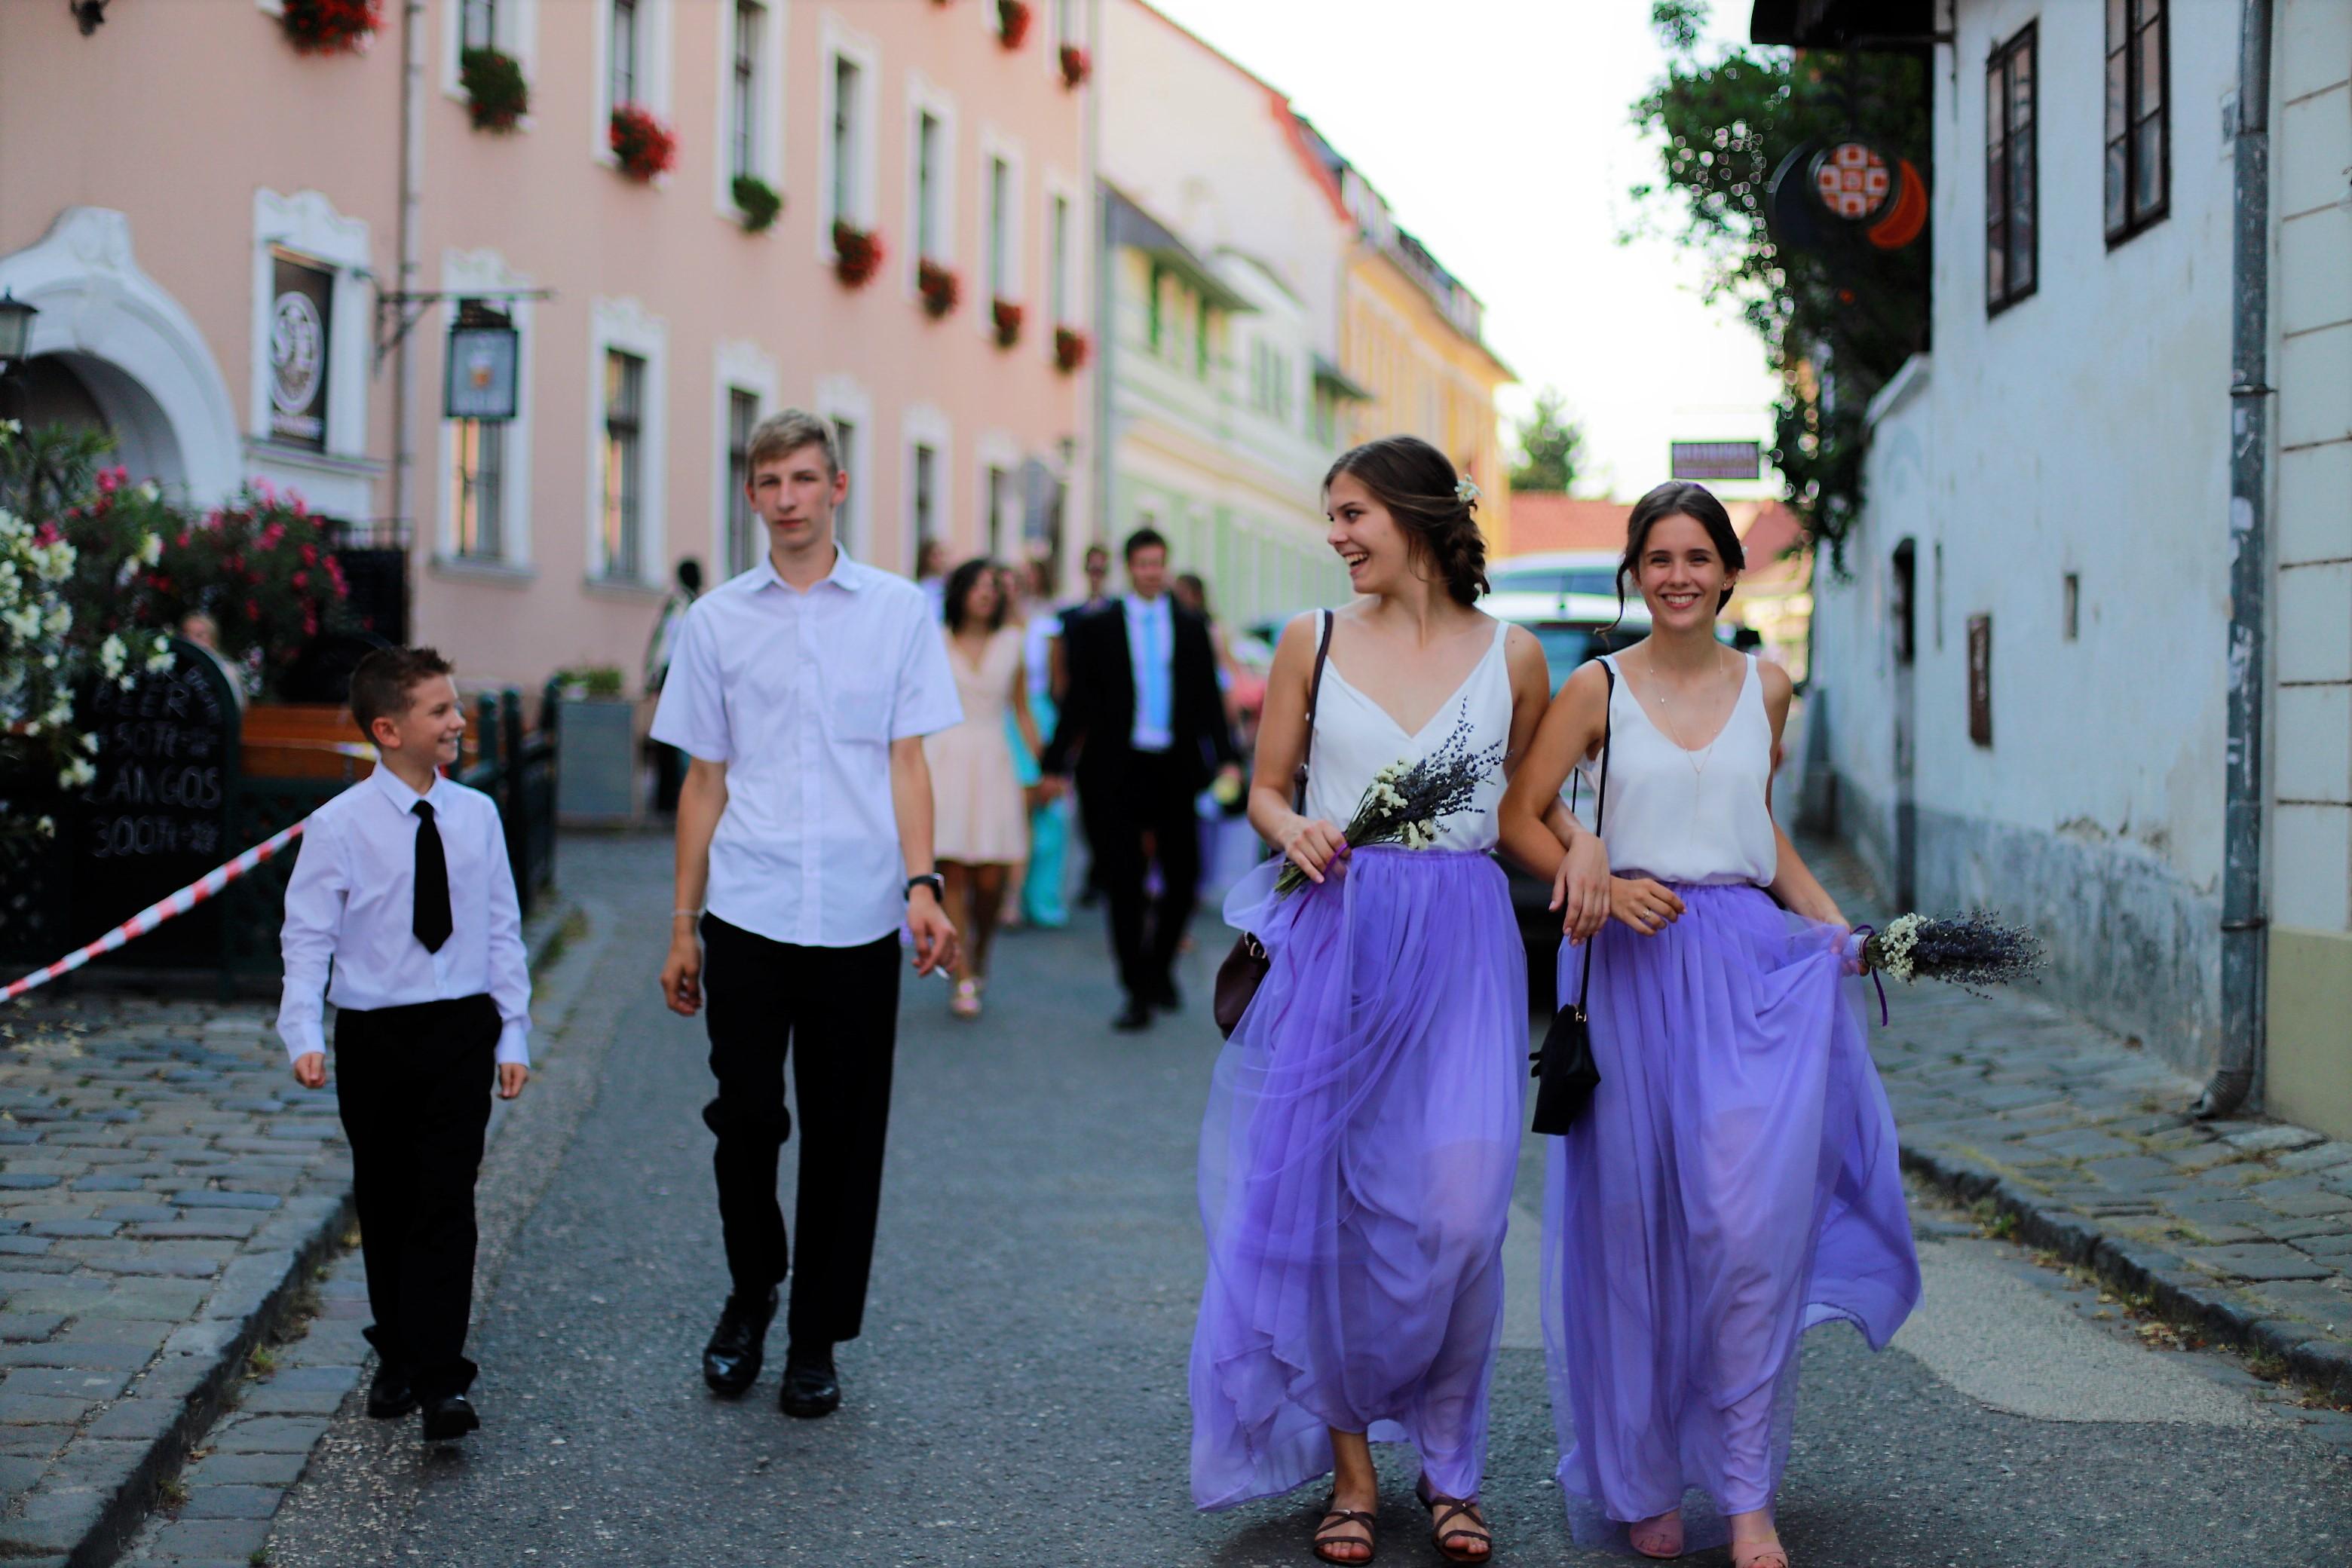 bridesmaids laughing, candid photos of wedding